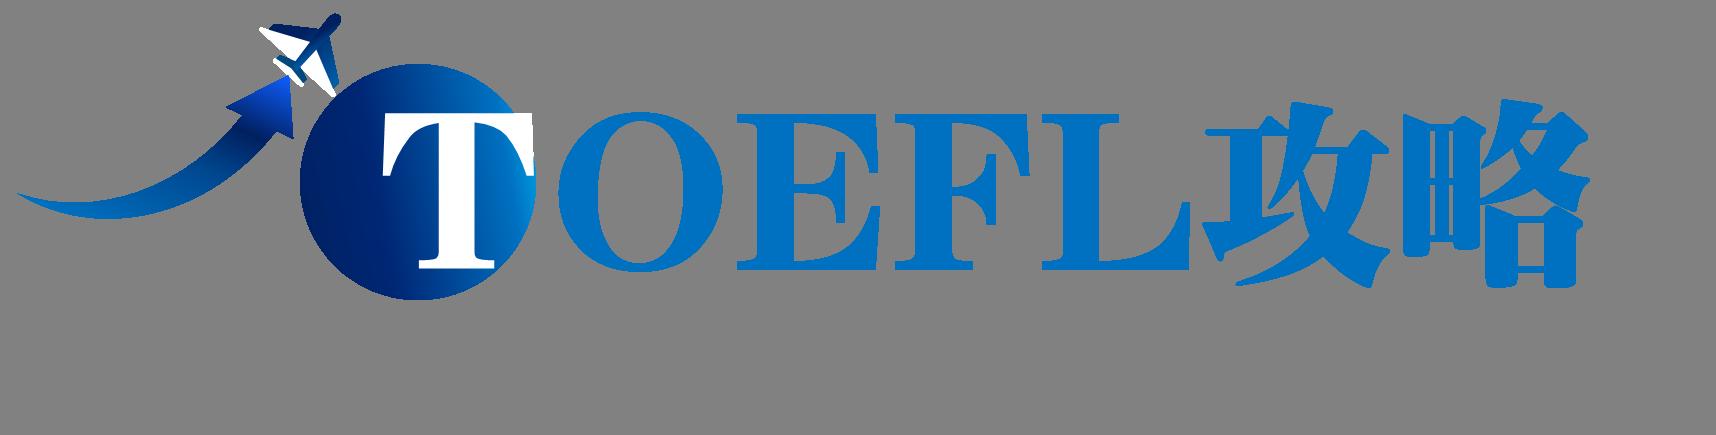 logo name 2